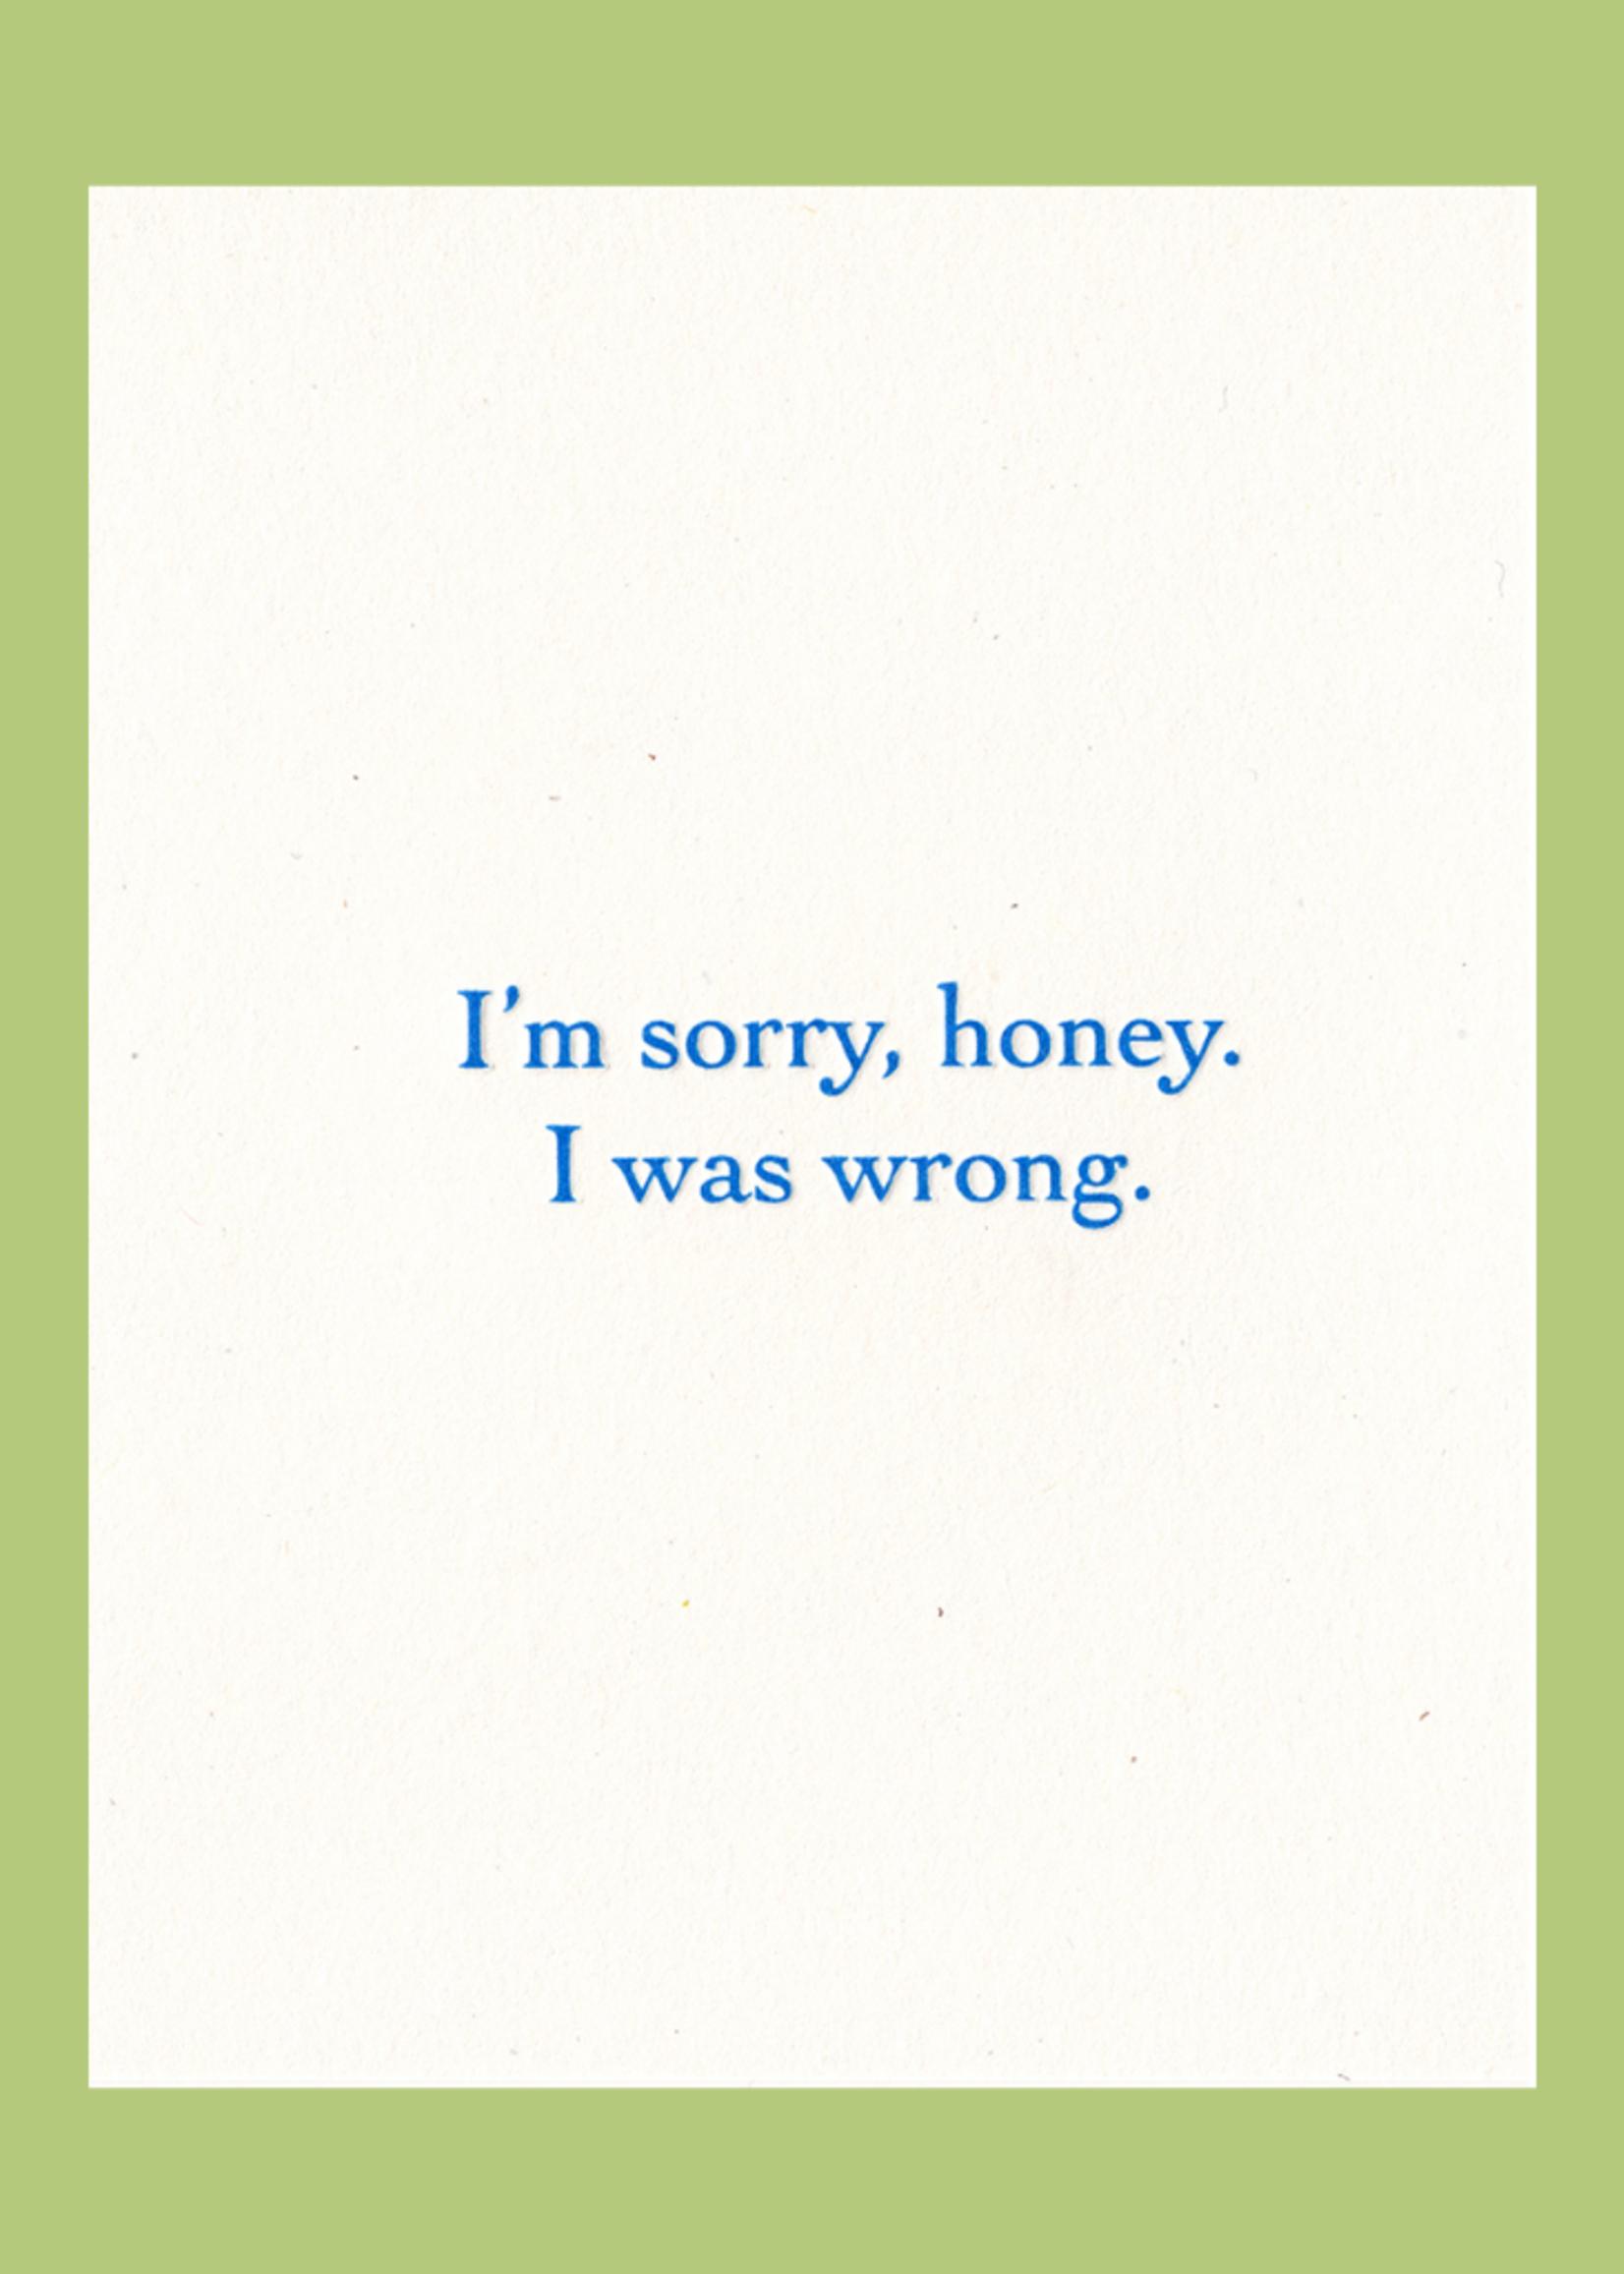 Lady Pilot Letterpress Sorry Honey Apology Card